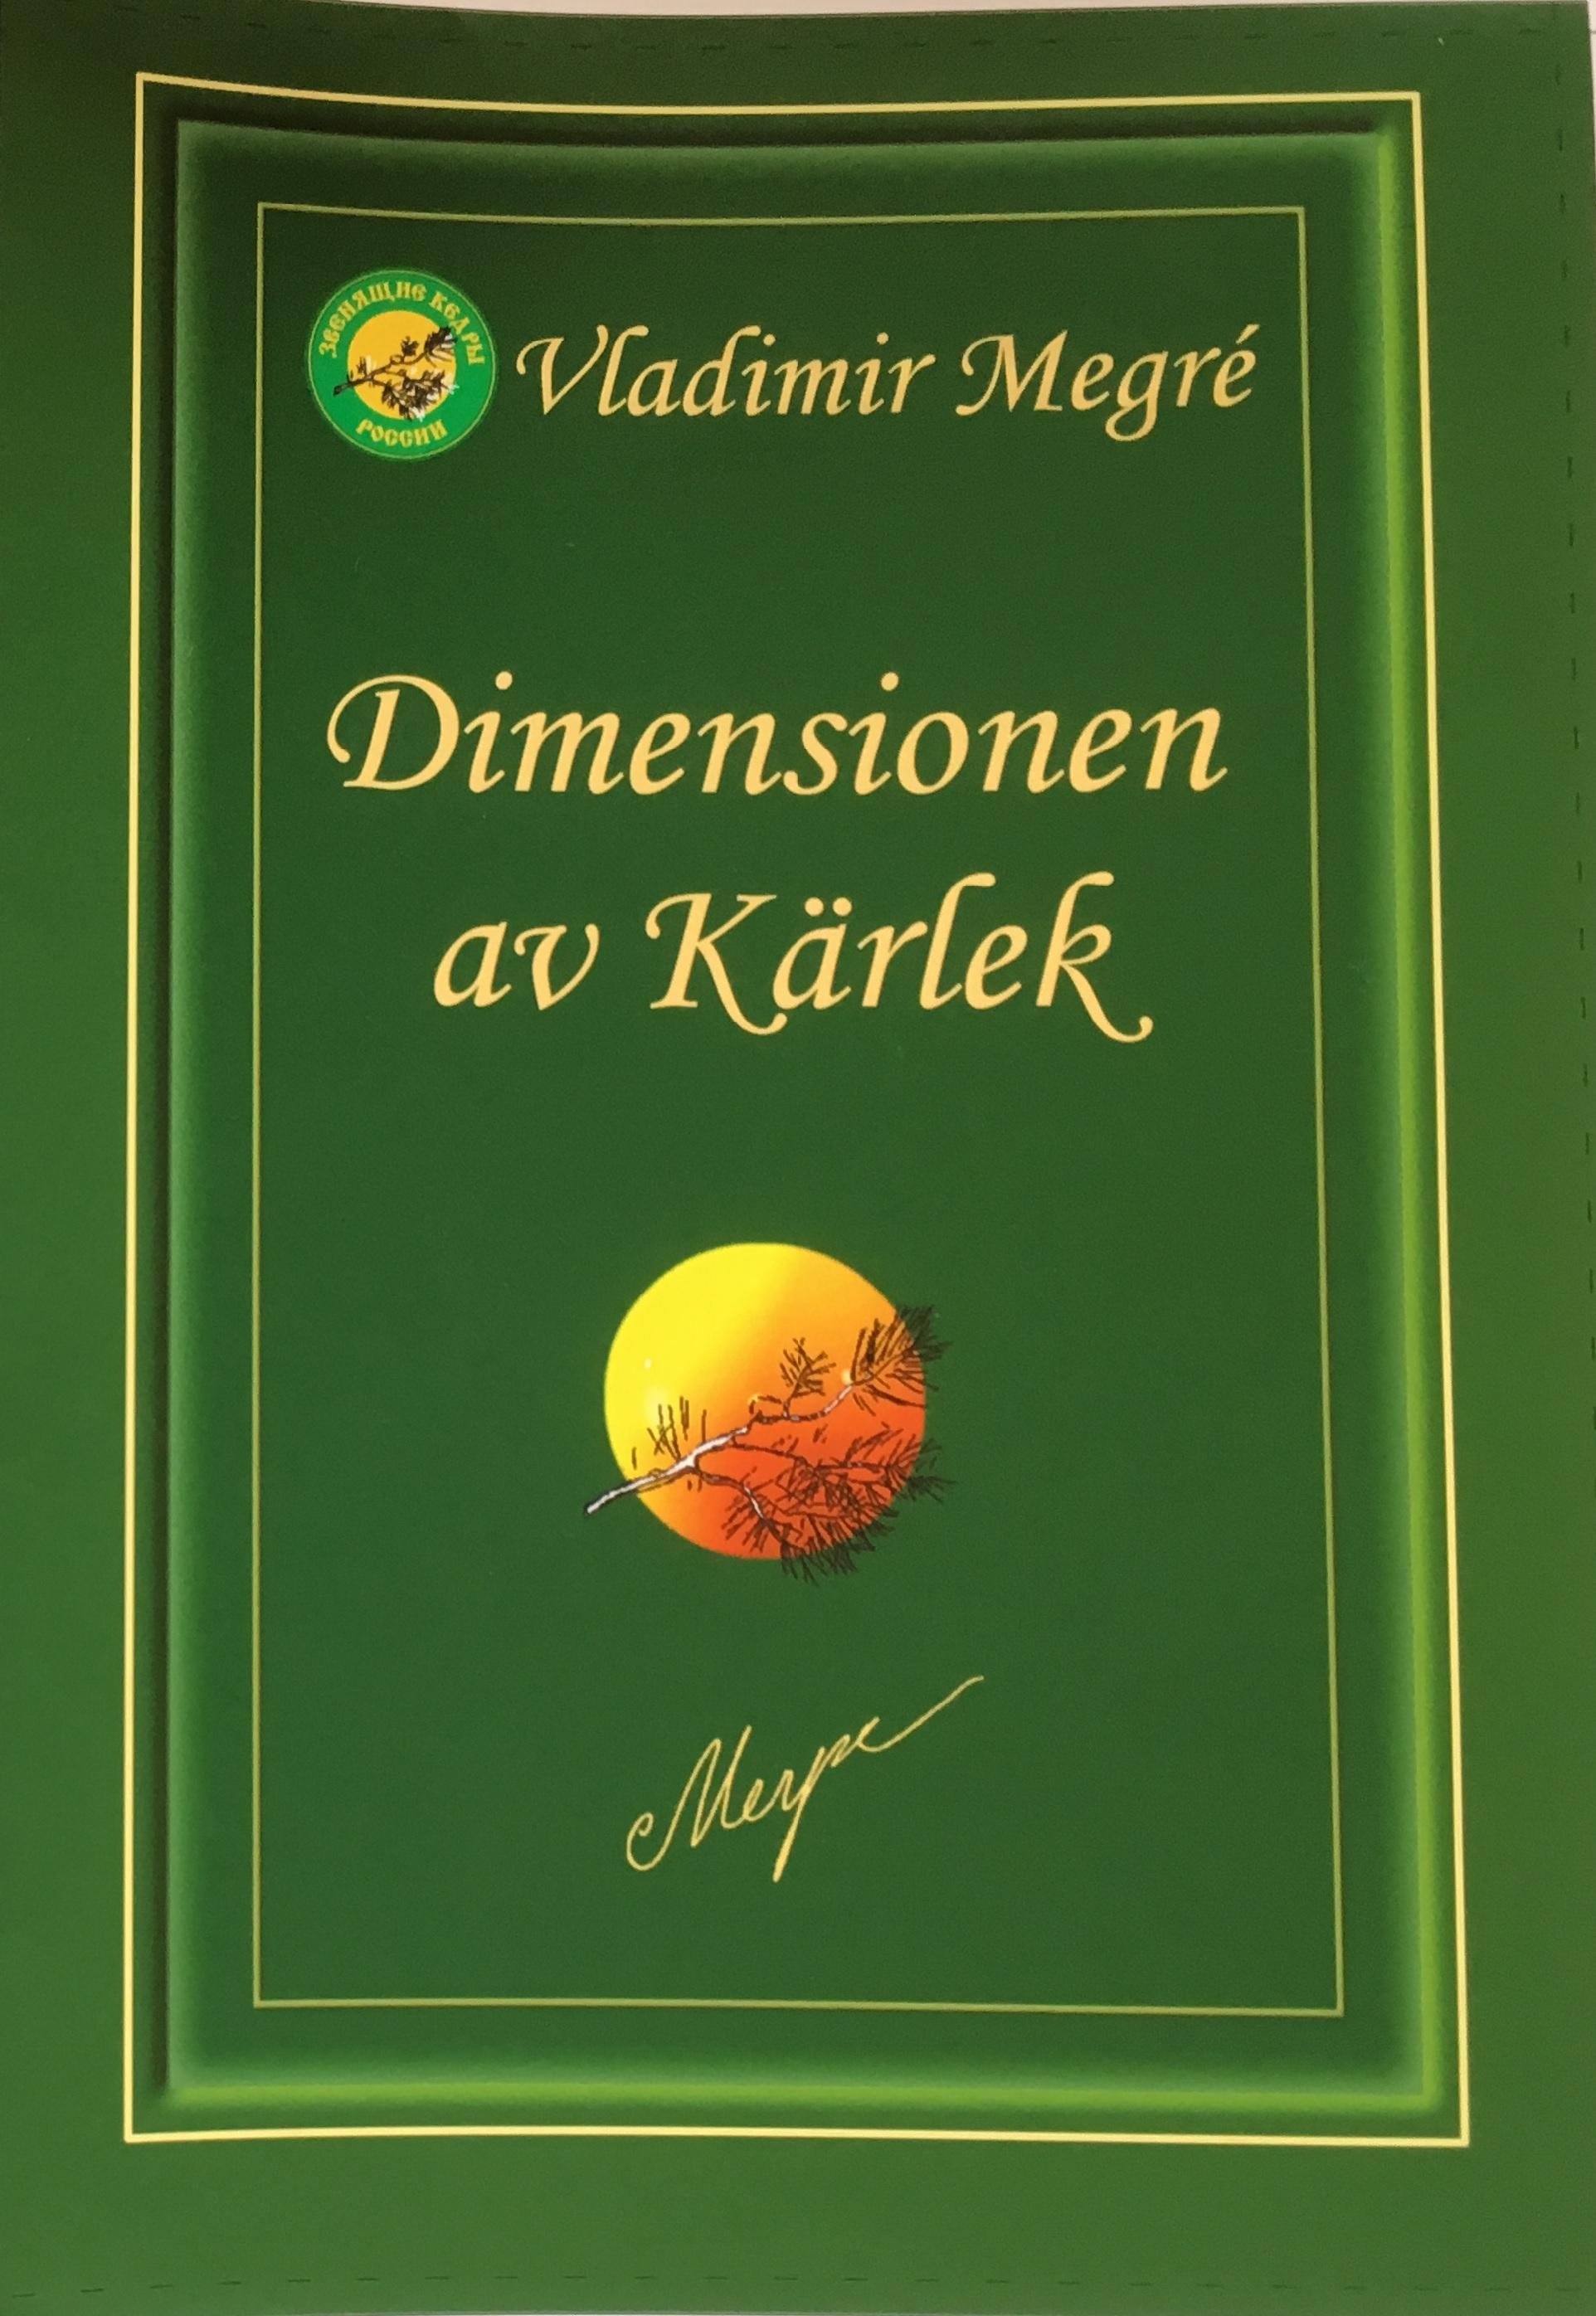 Швеция 3 книга.jpg